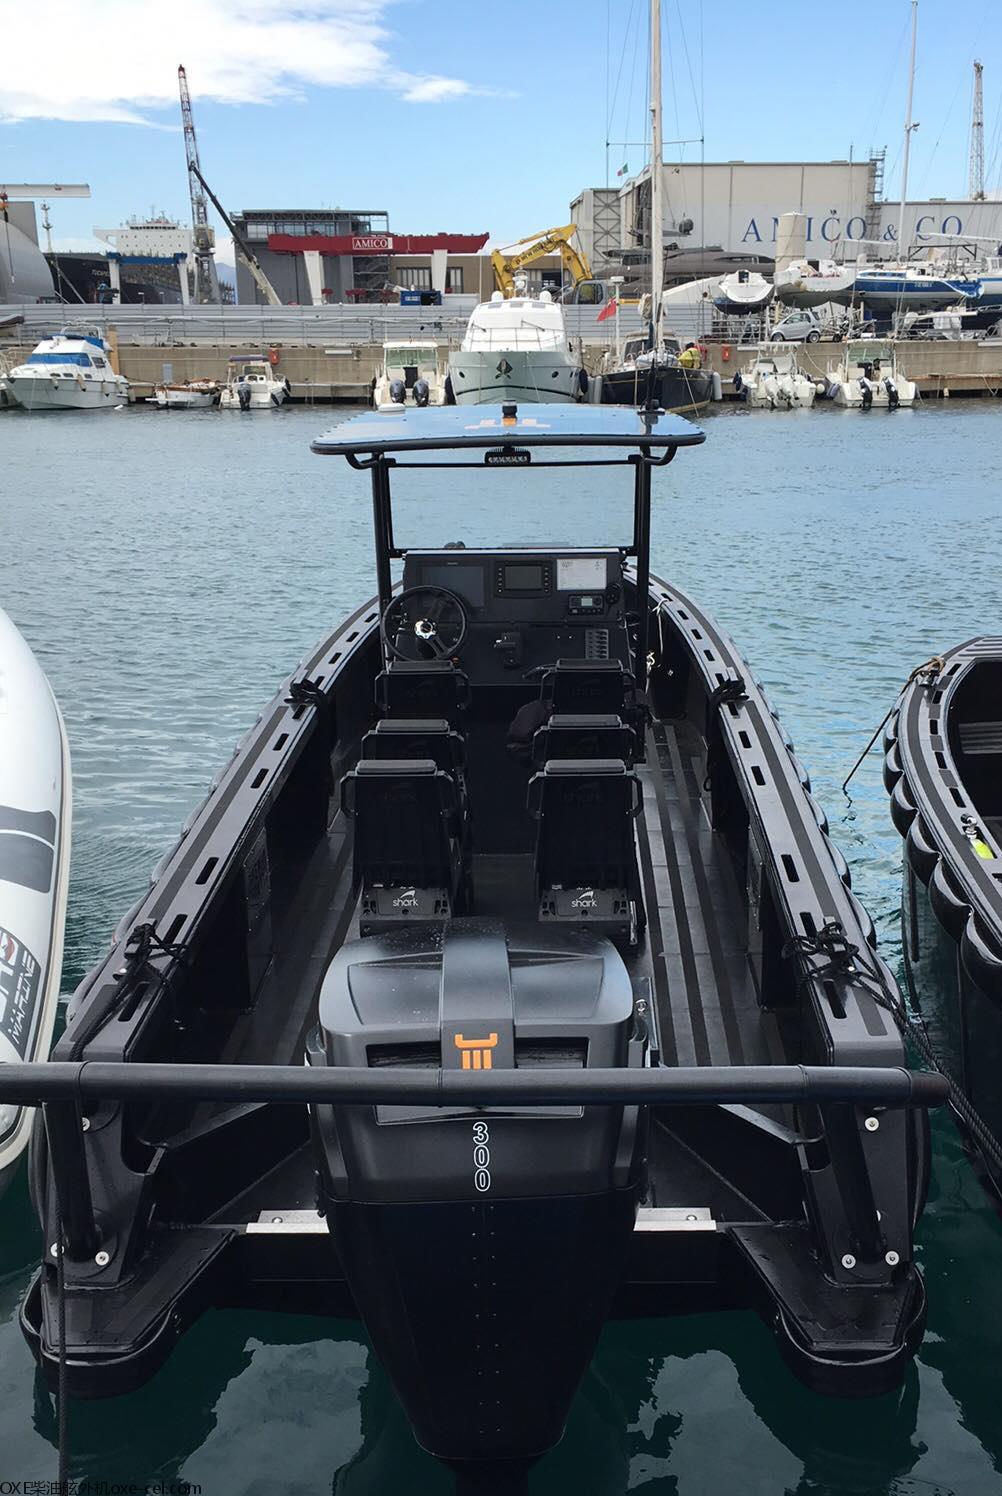 Tide Man Boat搭载OXE 300马力柴油舷外机